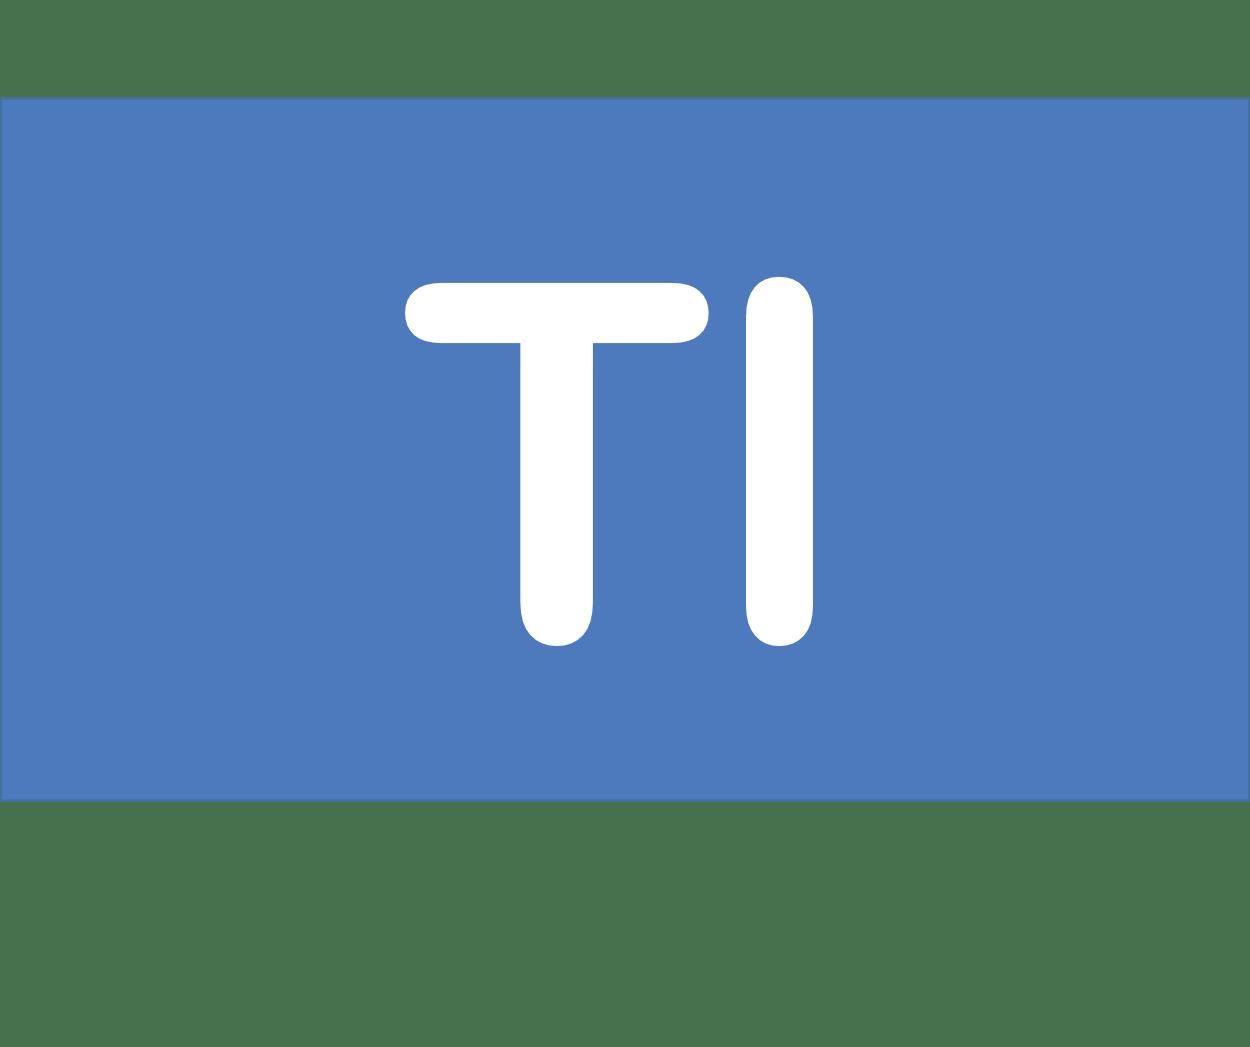 81 Tl タリウム Thallium 元素 記号 周期表 化学 原子